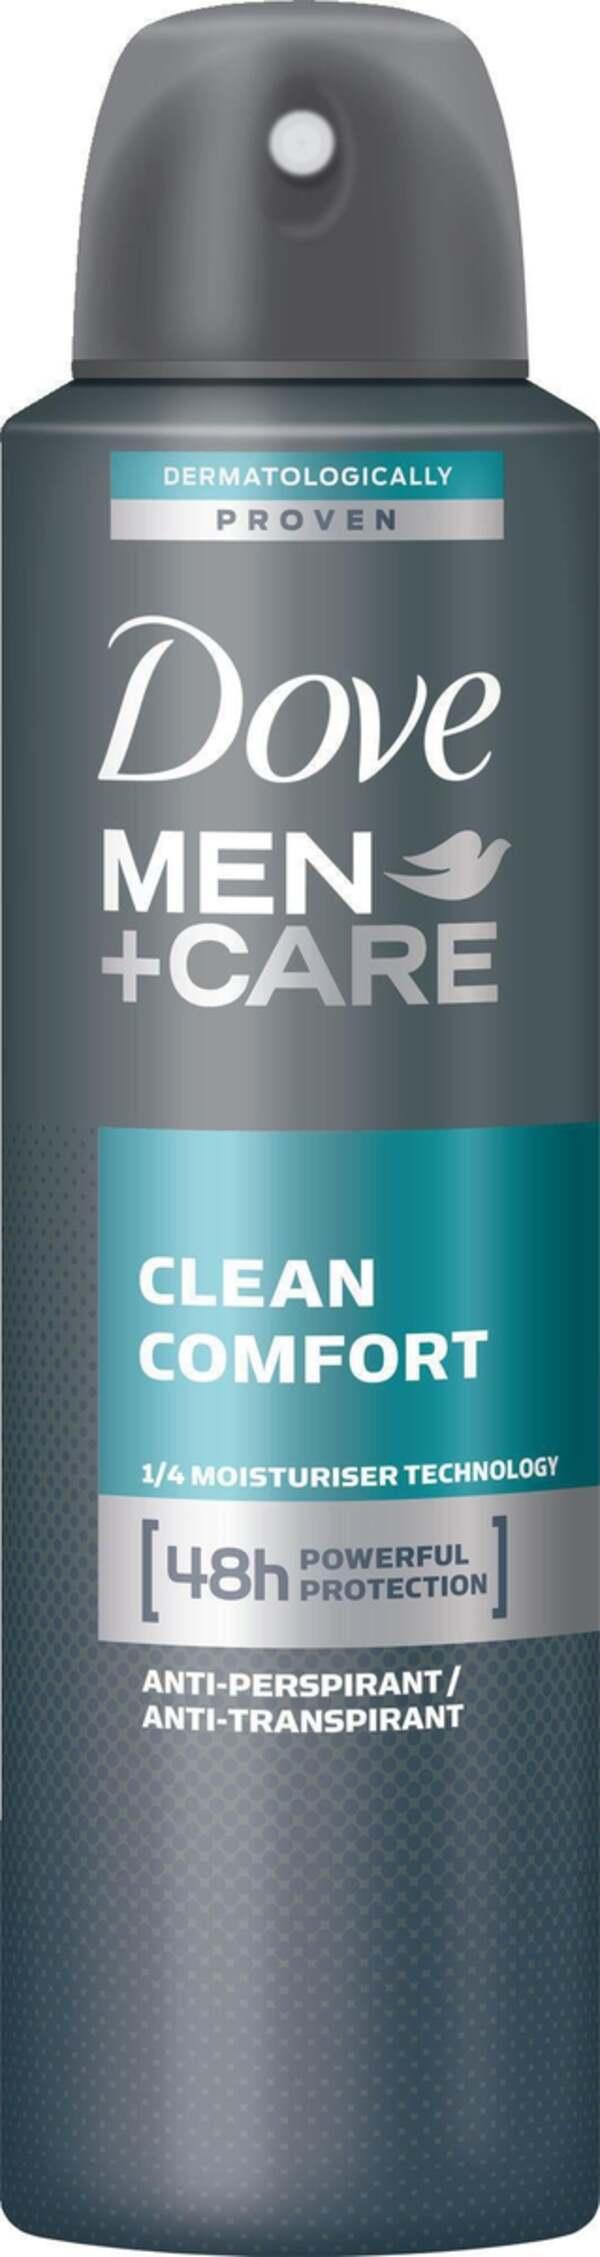 Dove Men+Care              Clean Comfort Deo-Spray